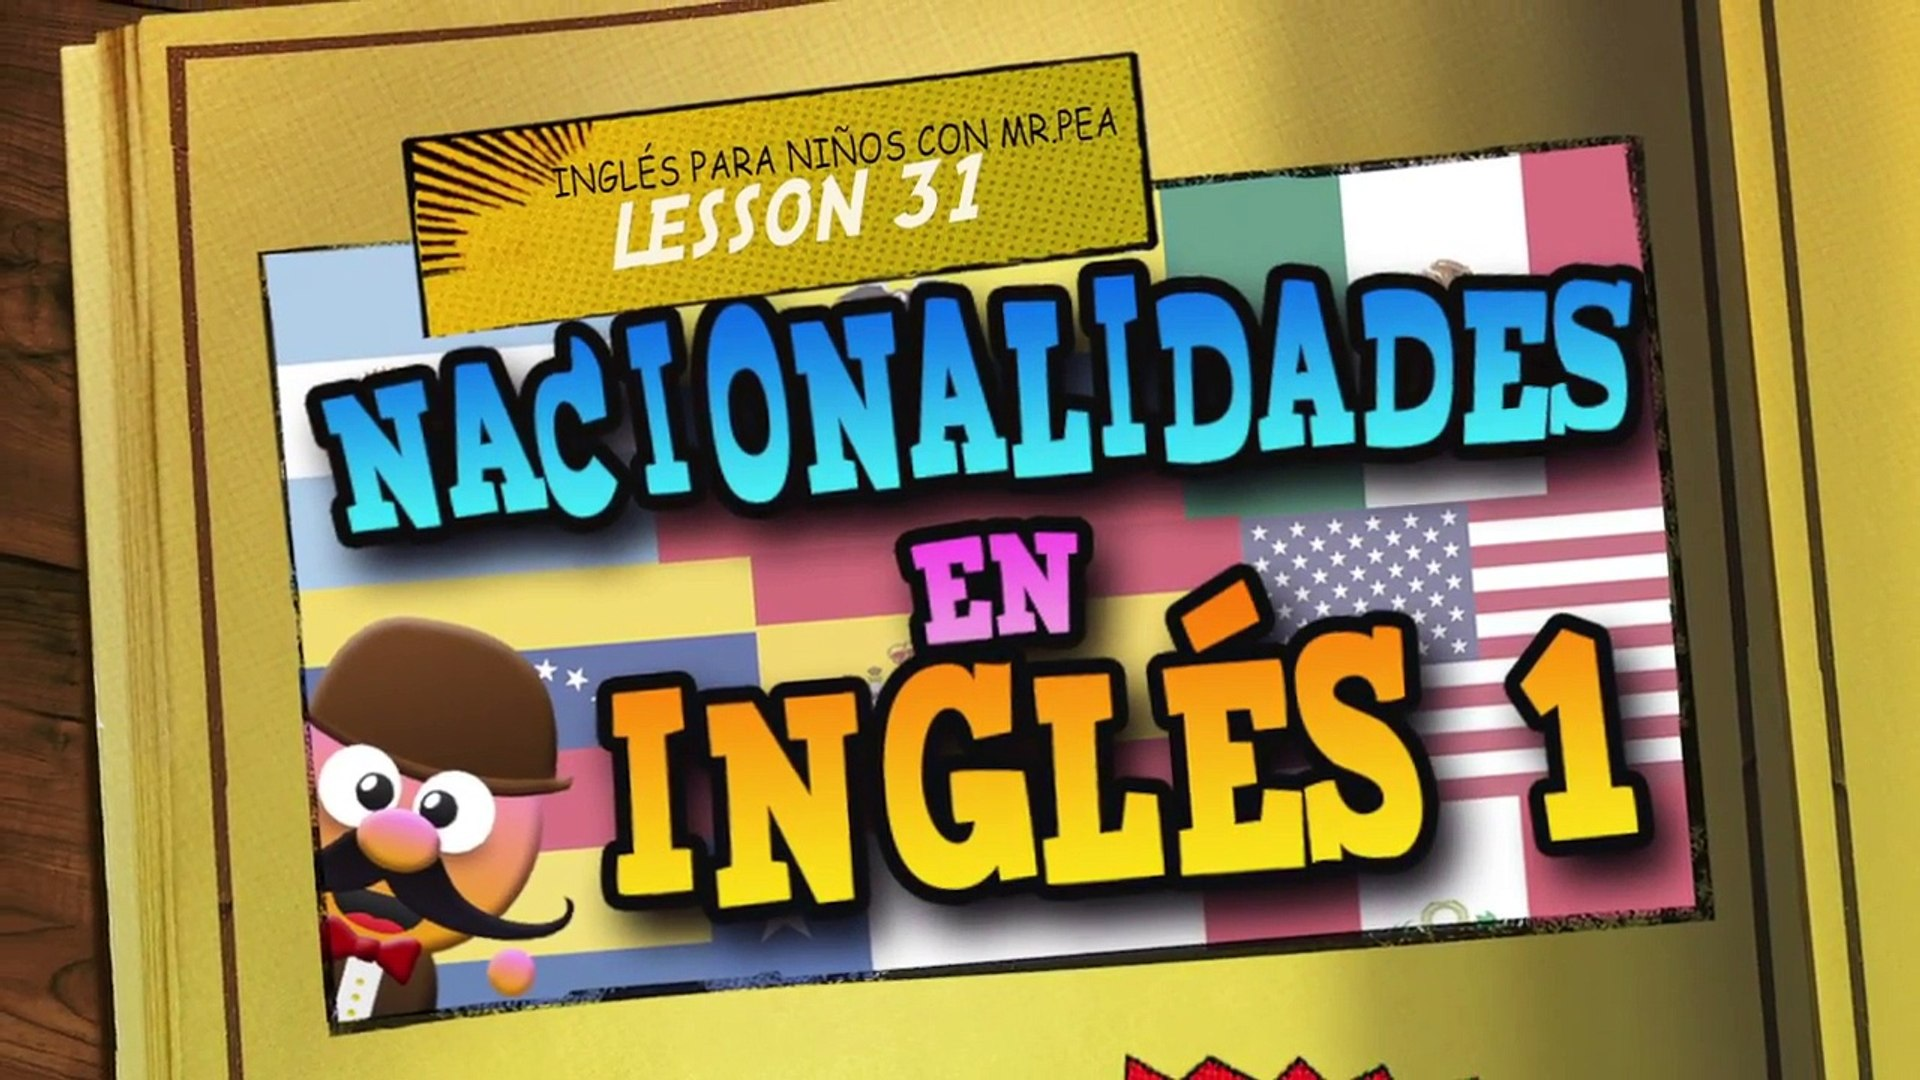 Nacionalidades En Ingles 01 Aprende Ingles Con Mr Pea English For Kids Video Dailymotion